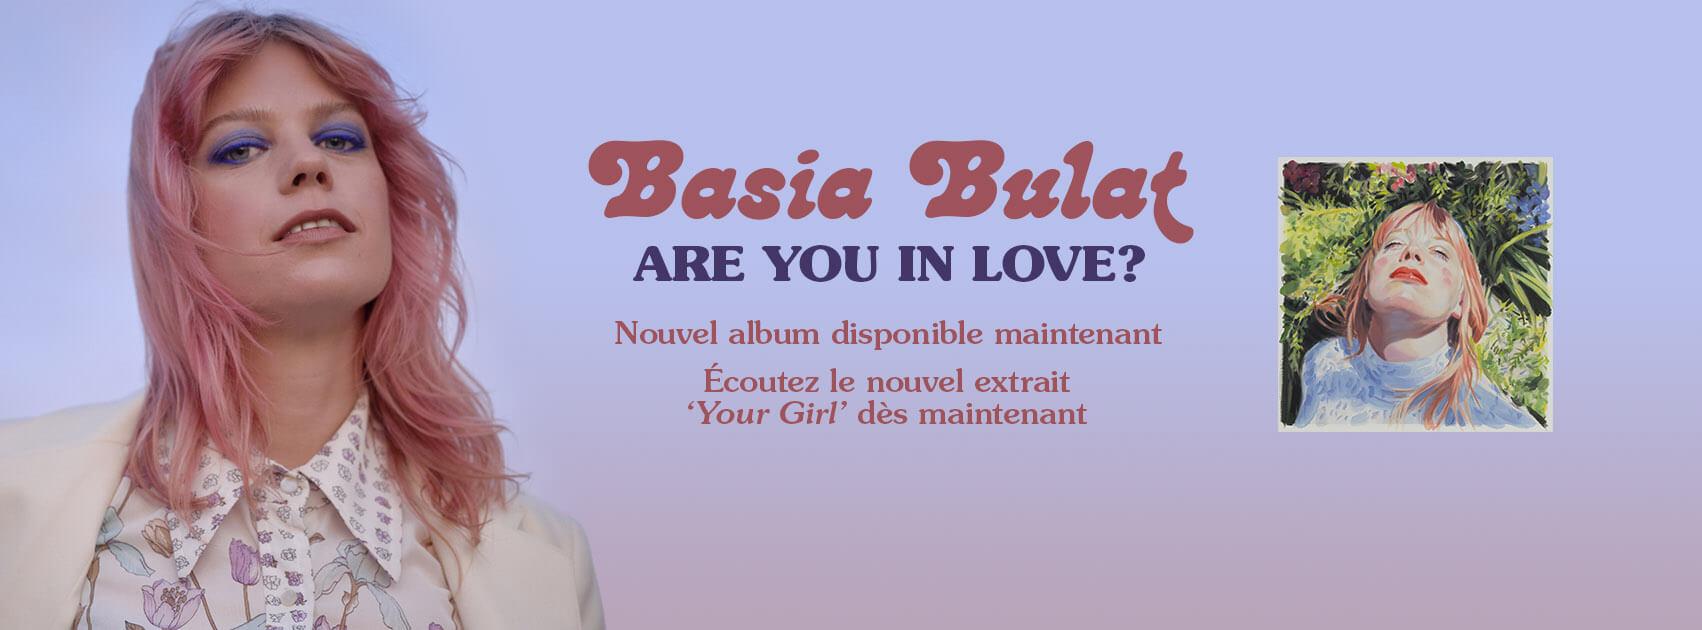 BasiaBulat-SCRWebsite-FR